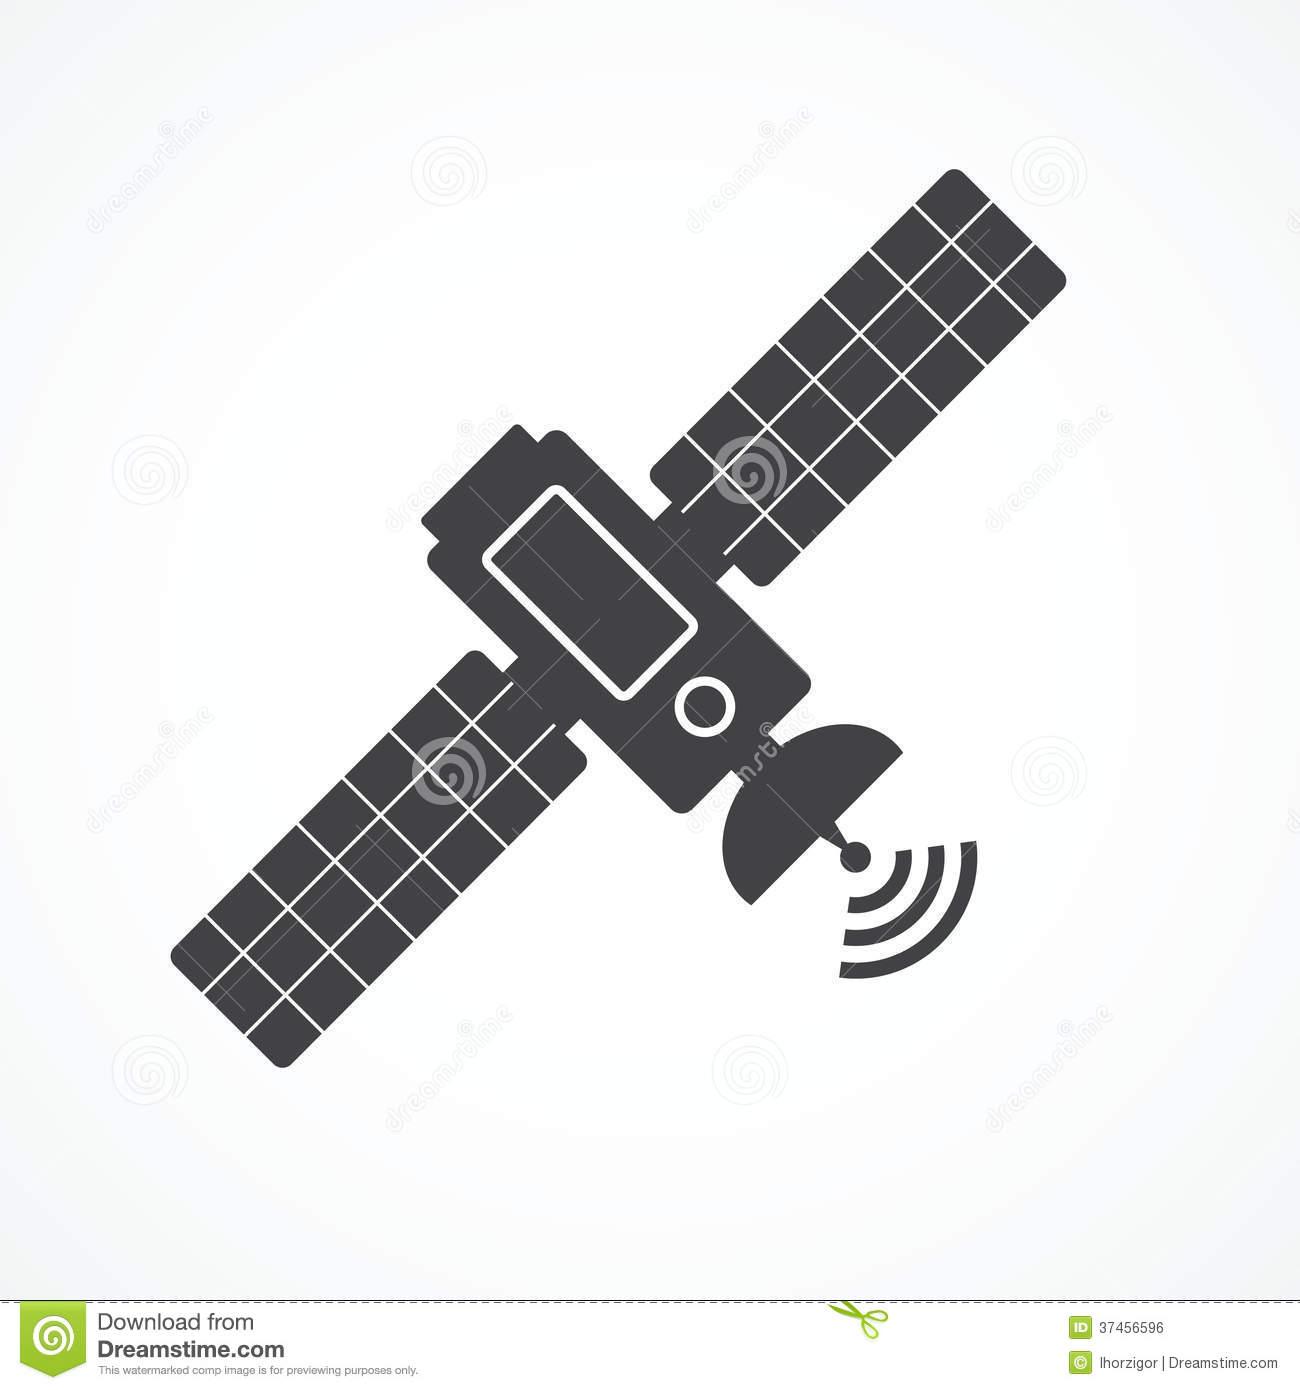 Gps Satellite Clipart.